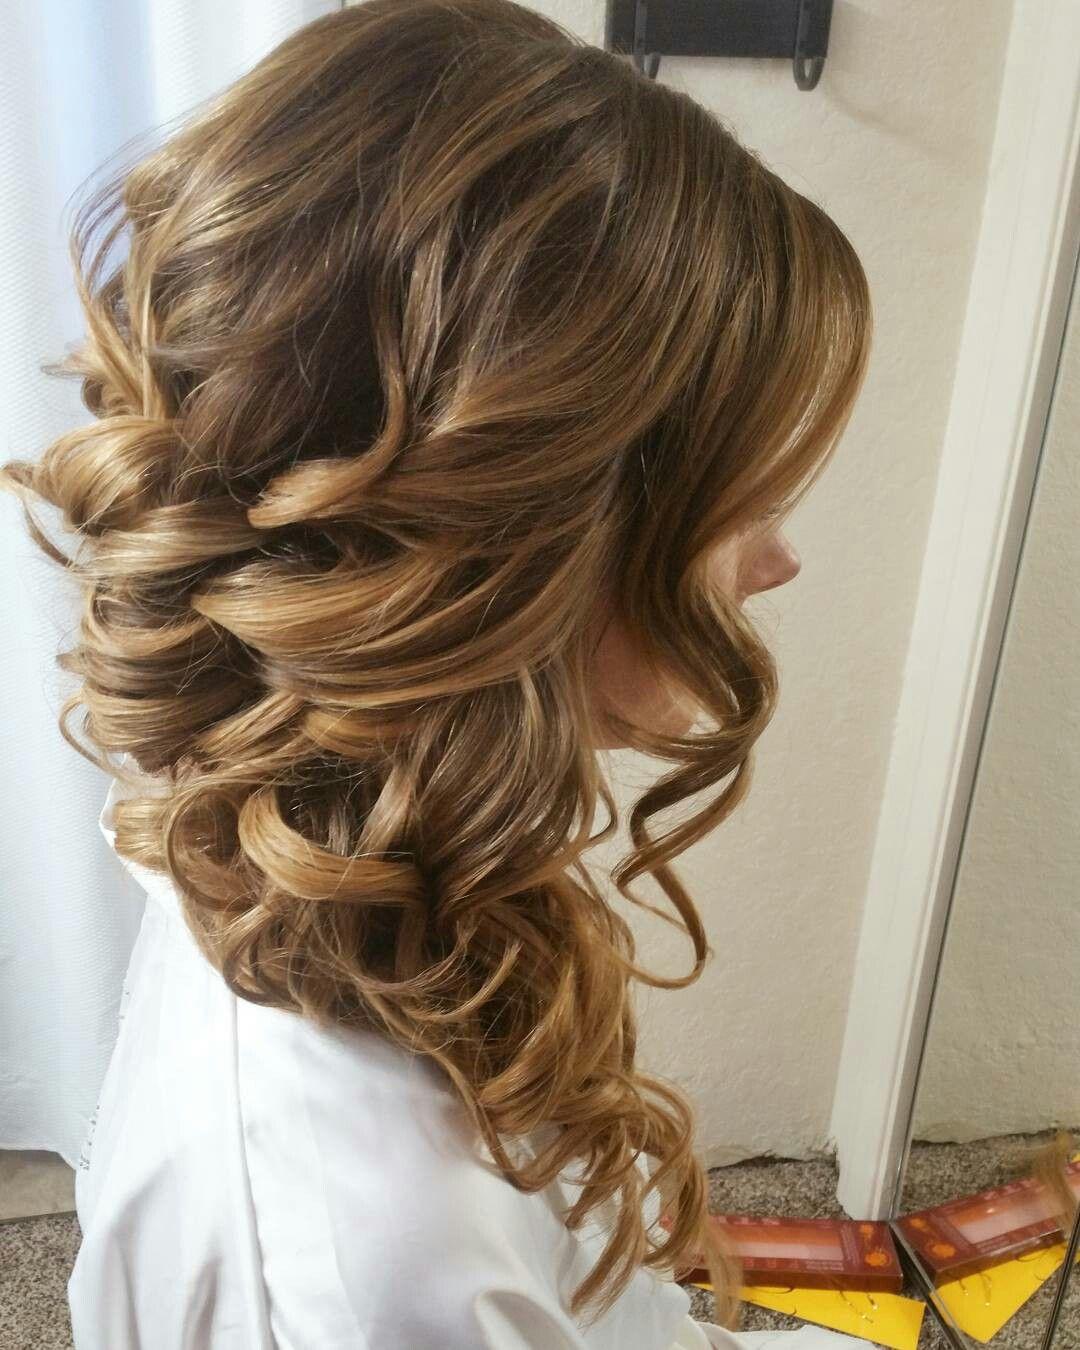 Faux braided wedding hairstyles. Braid. Side swept curled ...